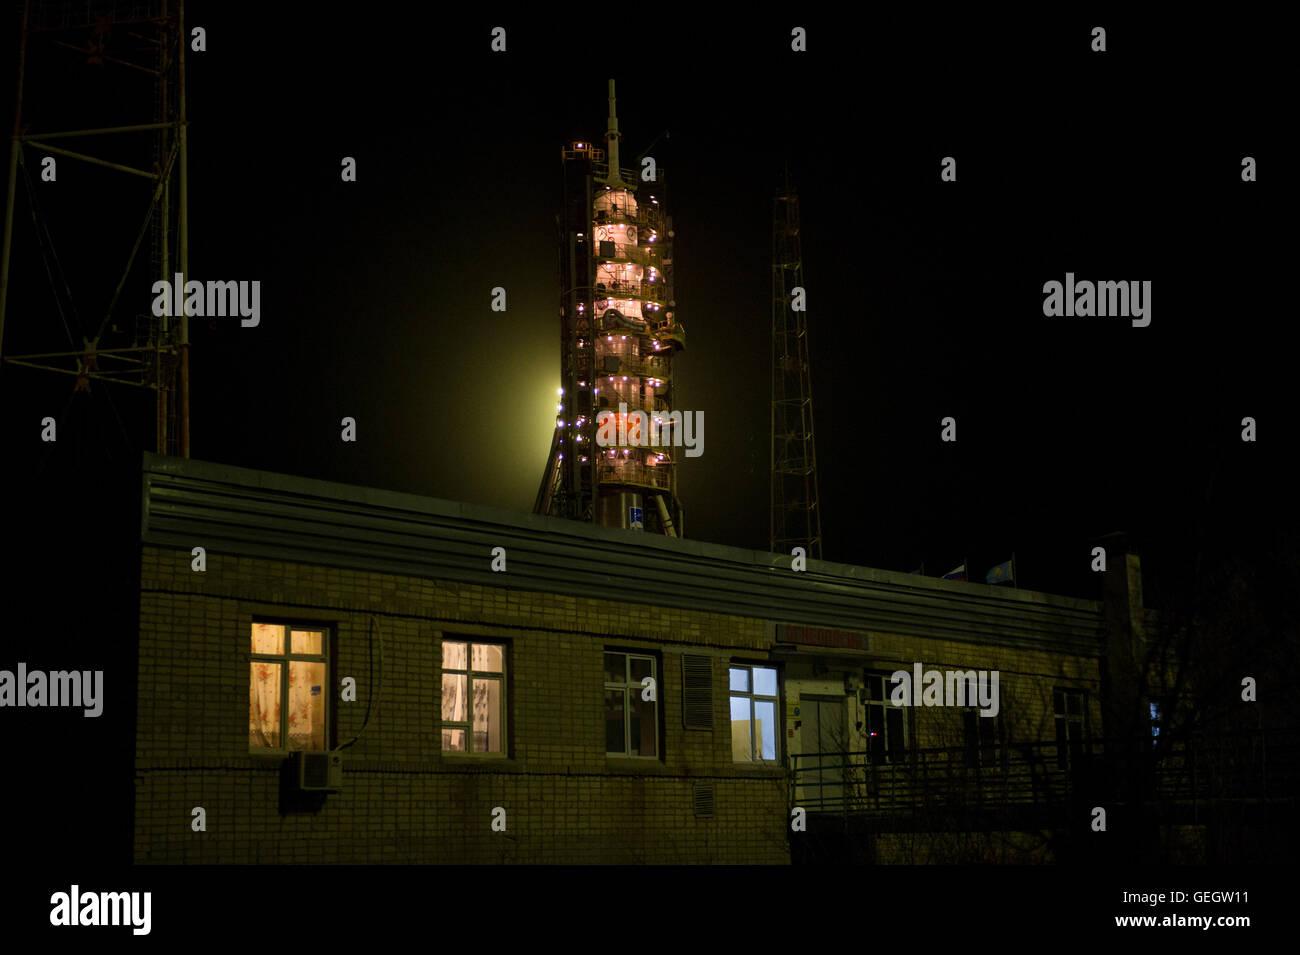 Exp 47 Soyuz Raising  03160027 Stock Photo